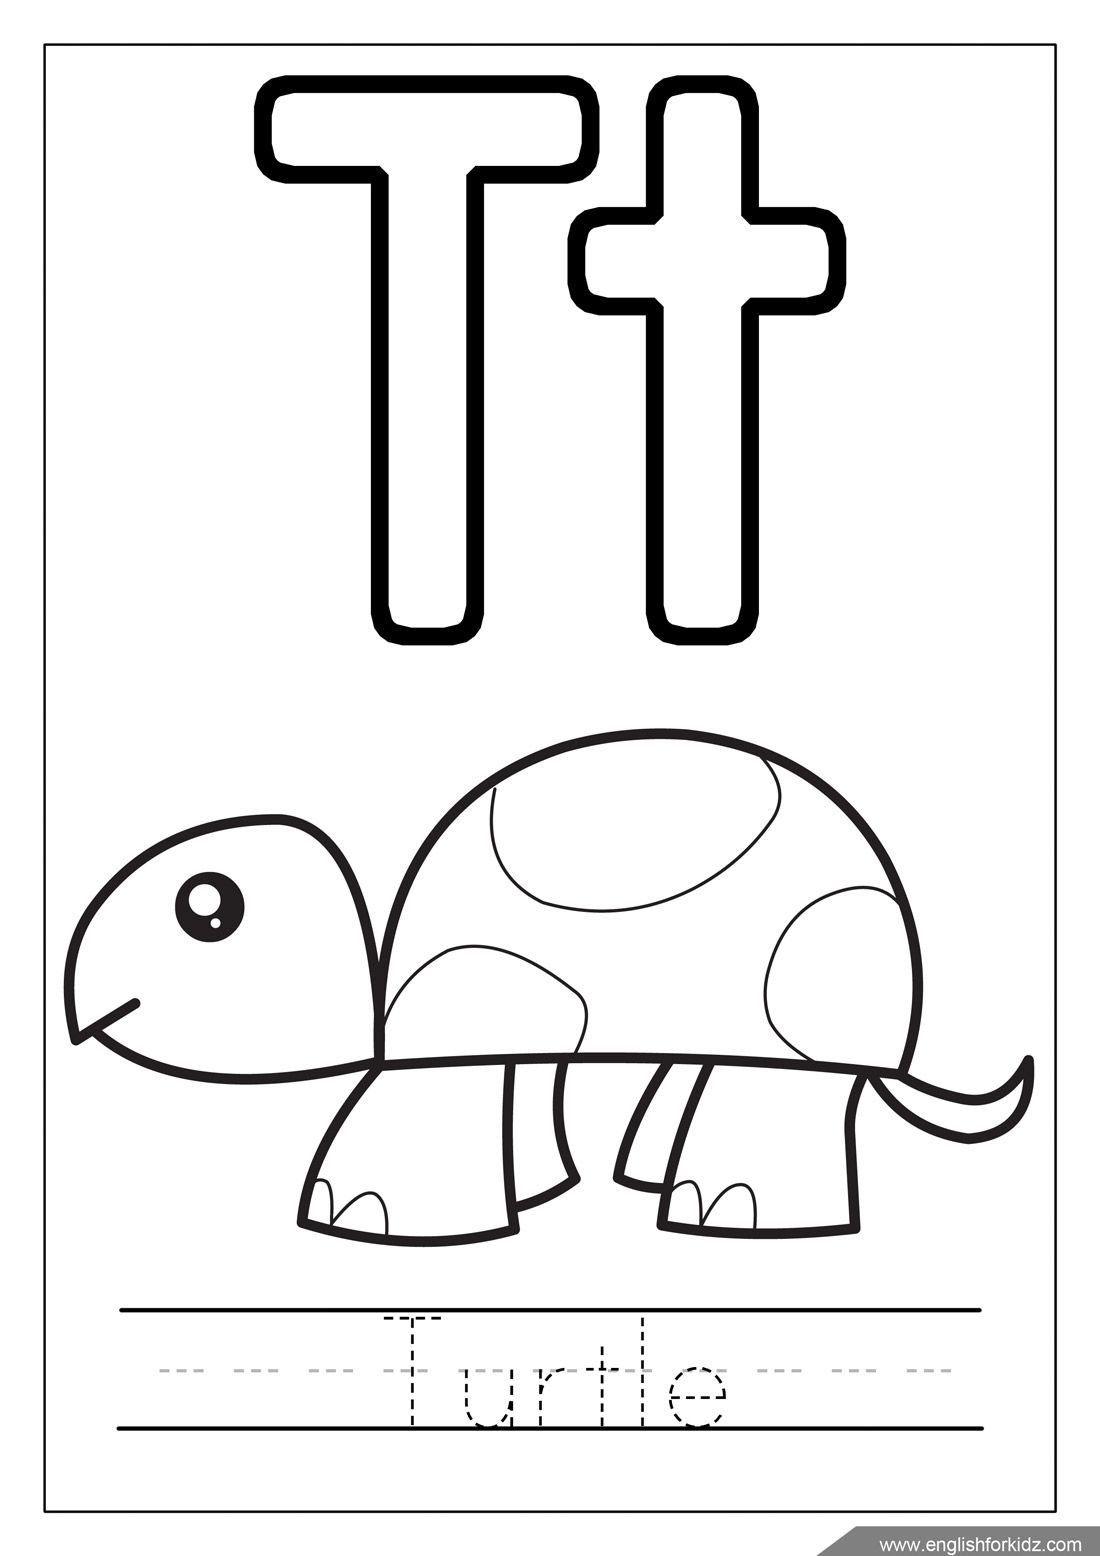 English Alphabet Coloring Page Alphabet Coloring Alphabet Coloring Pages Abc Coloring Pages